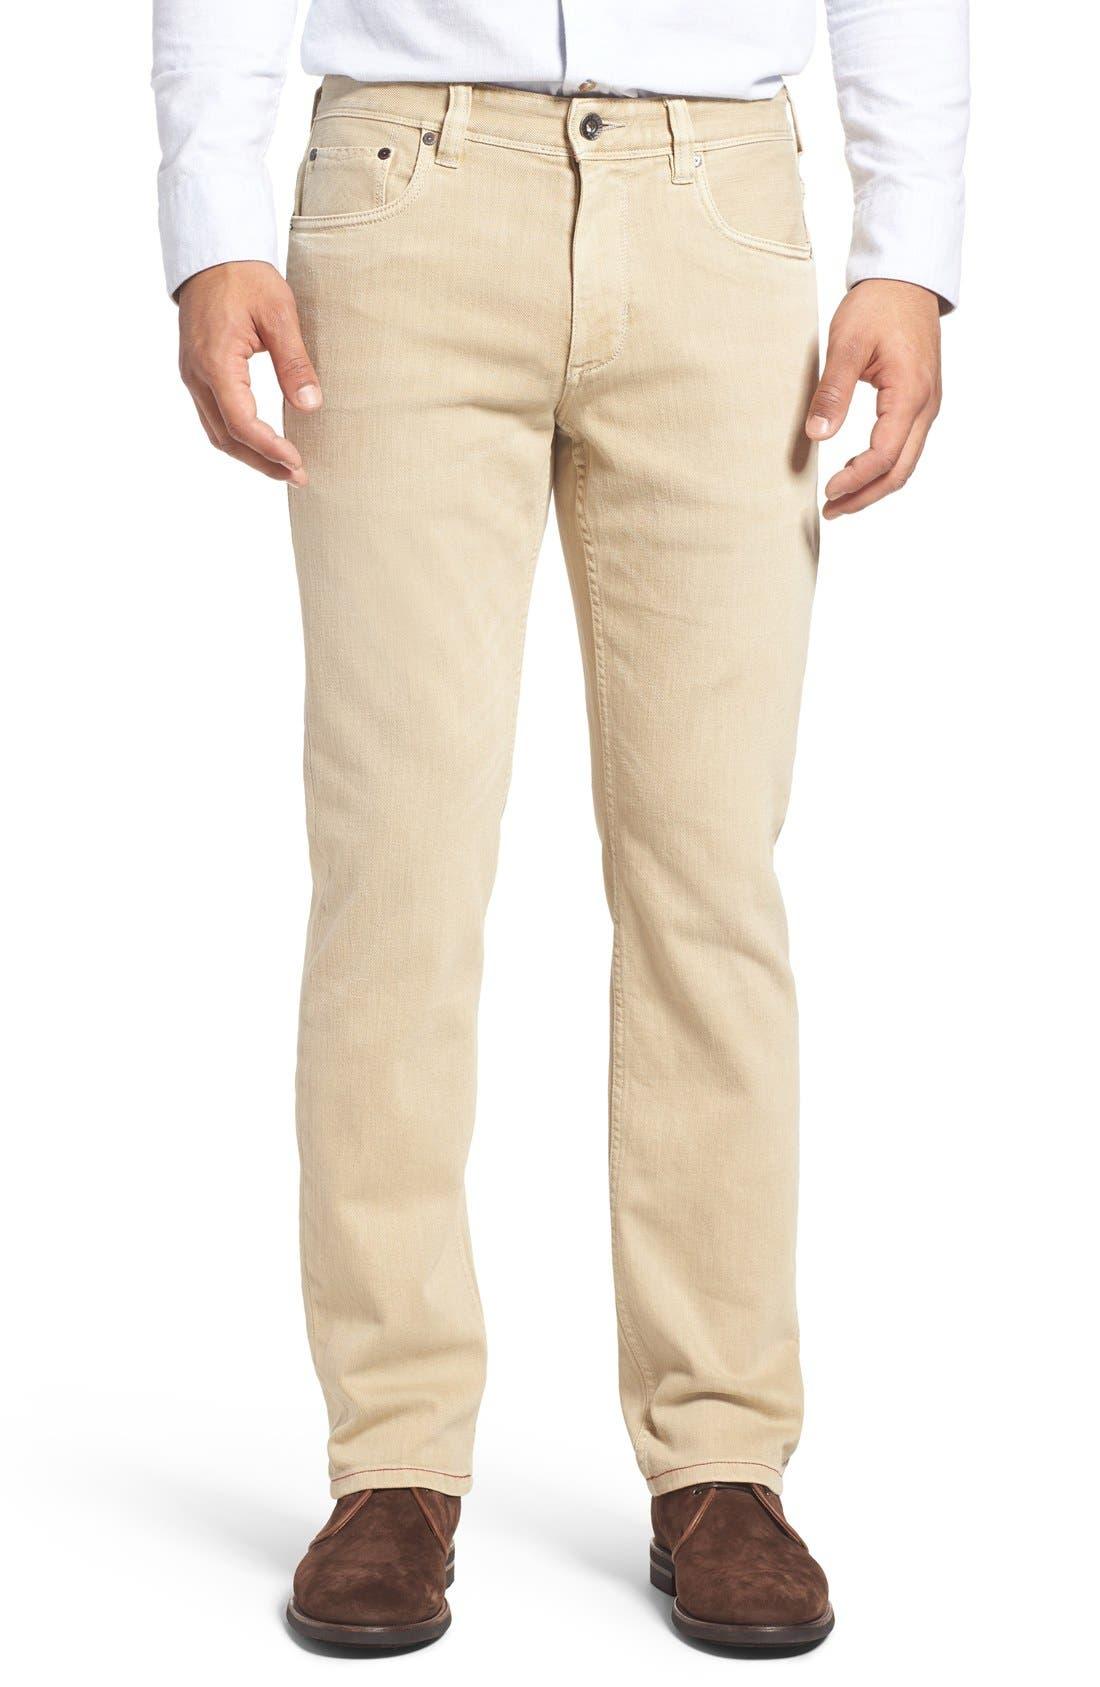 Weft Side Keys Pants,                         Main,                         color, Chino